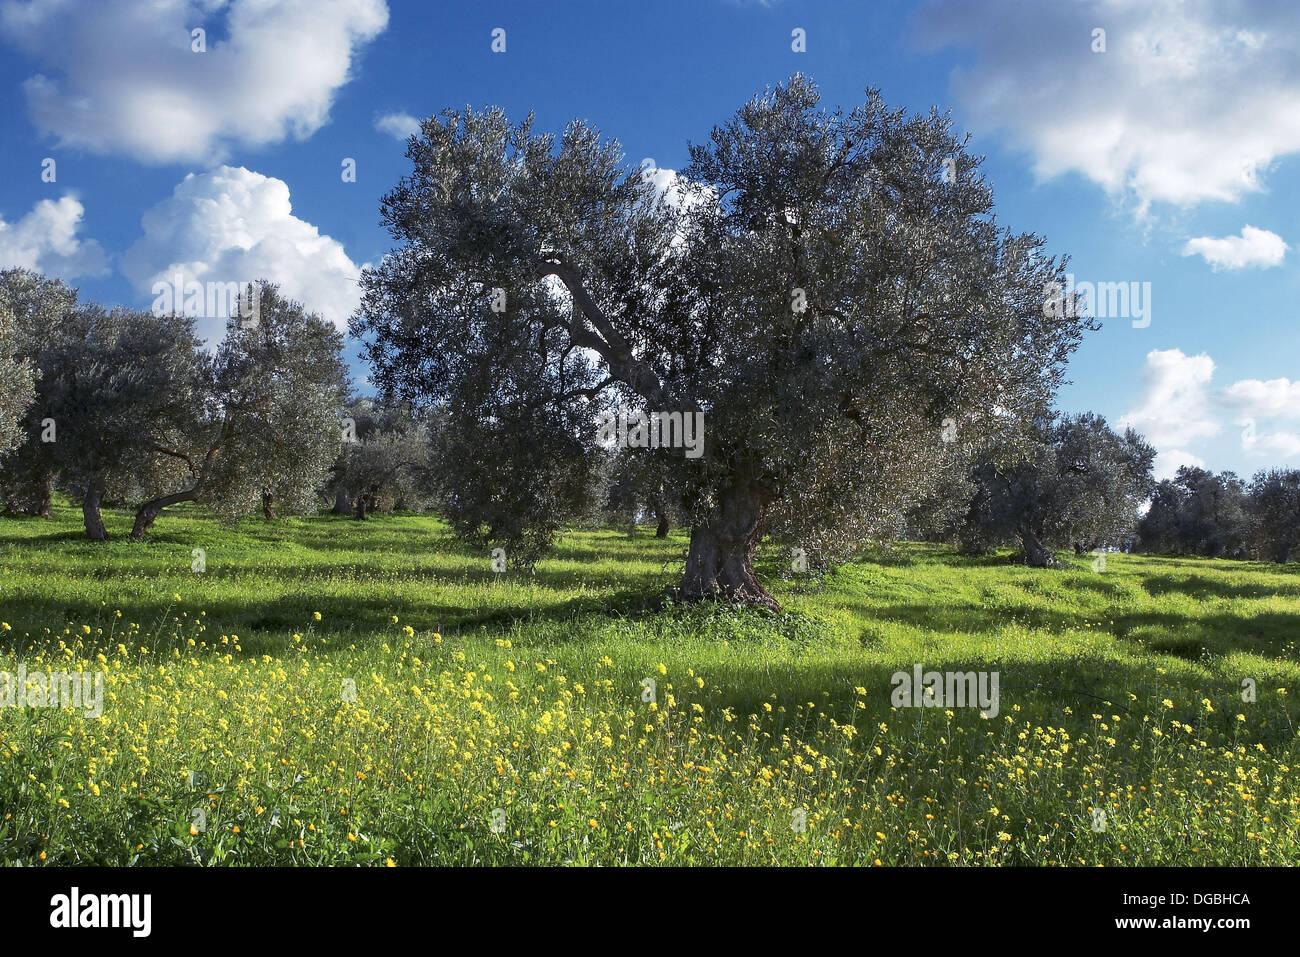 Olive Grove Dos Hermanas Sevilla Province Spain Stock Photo Alamy